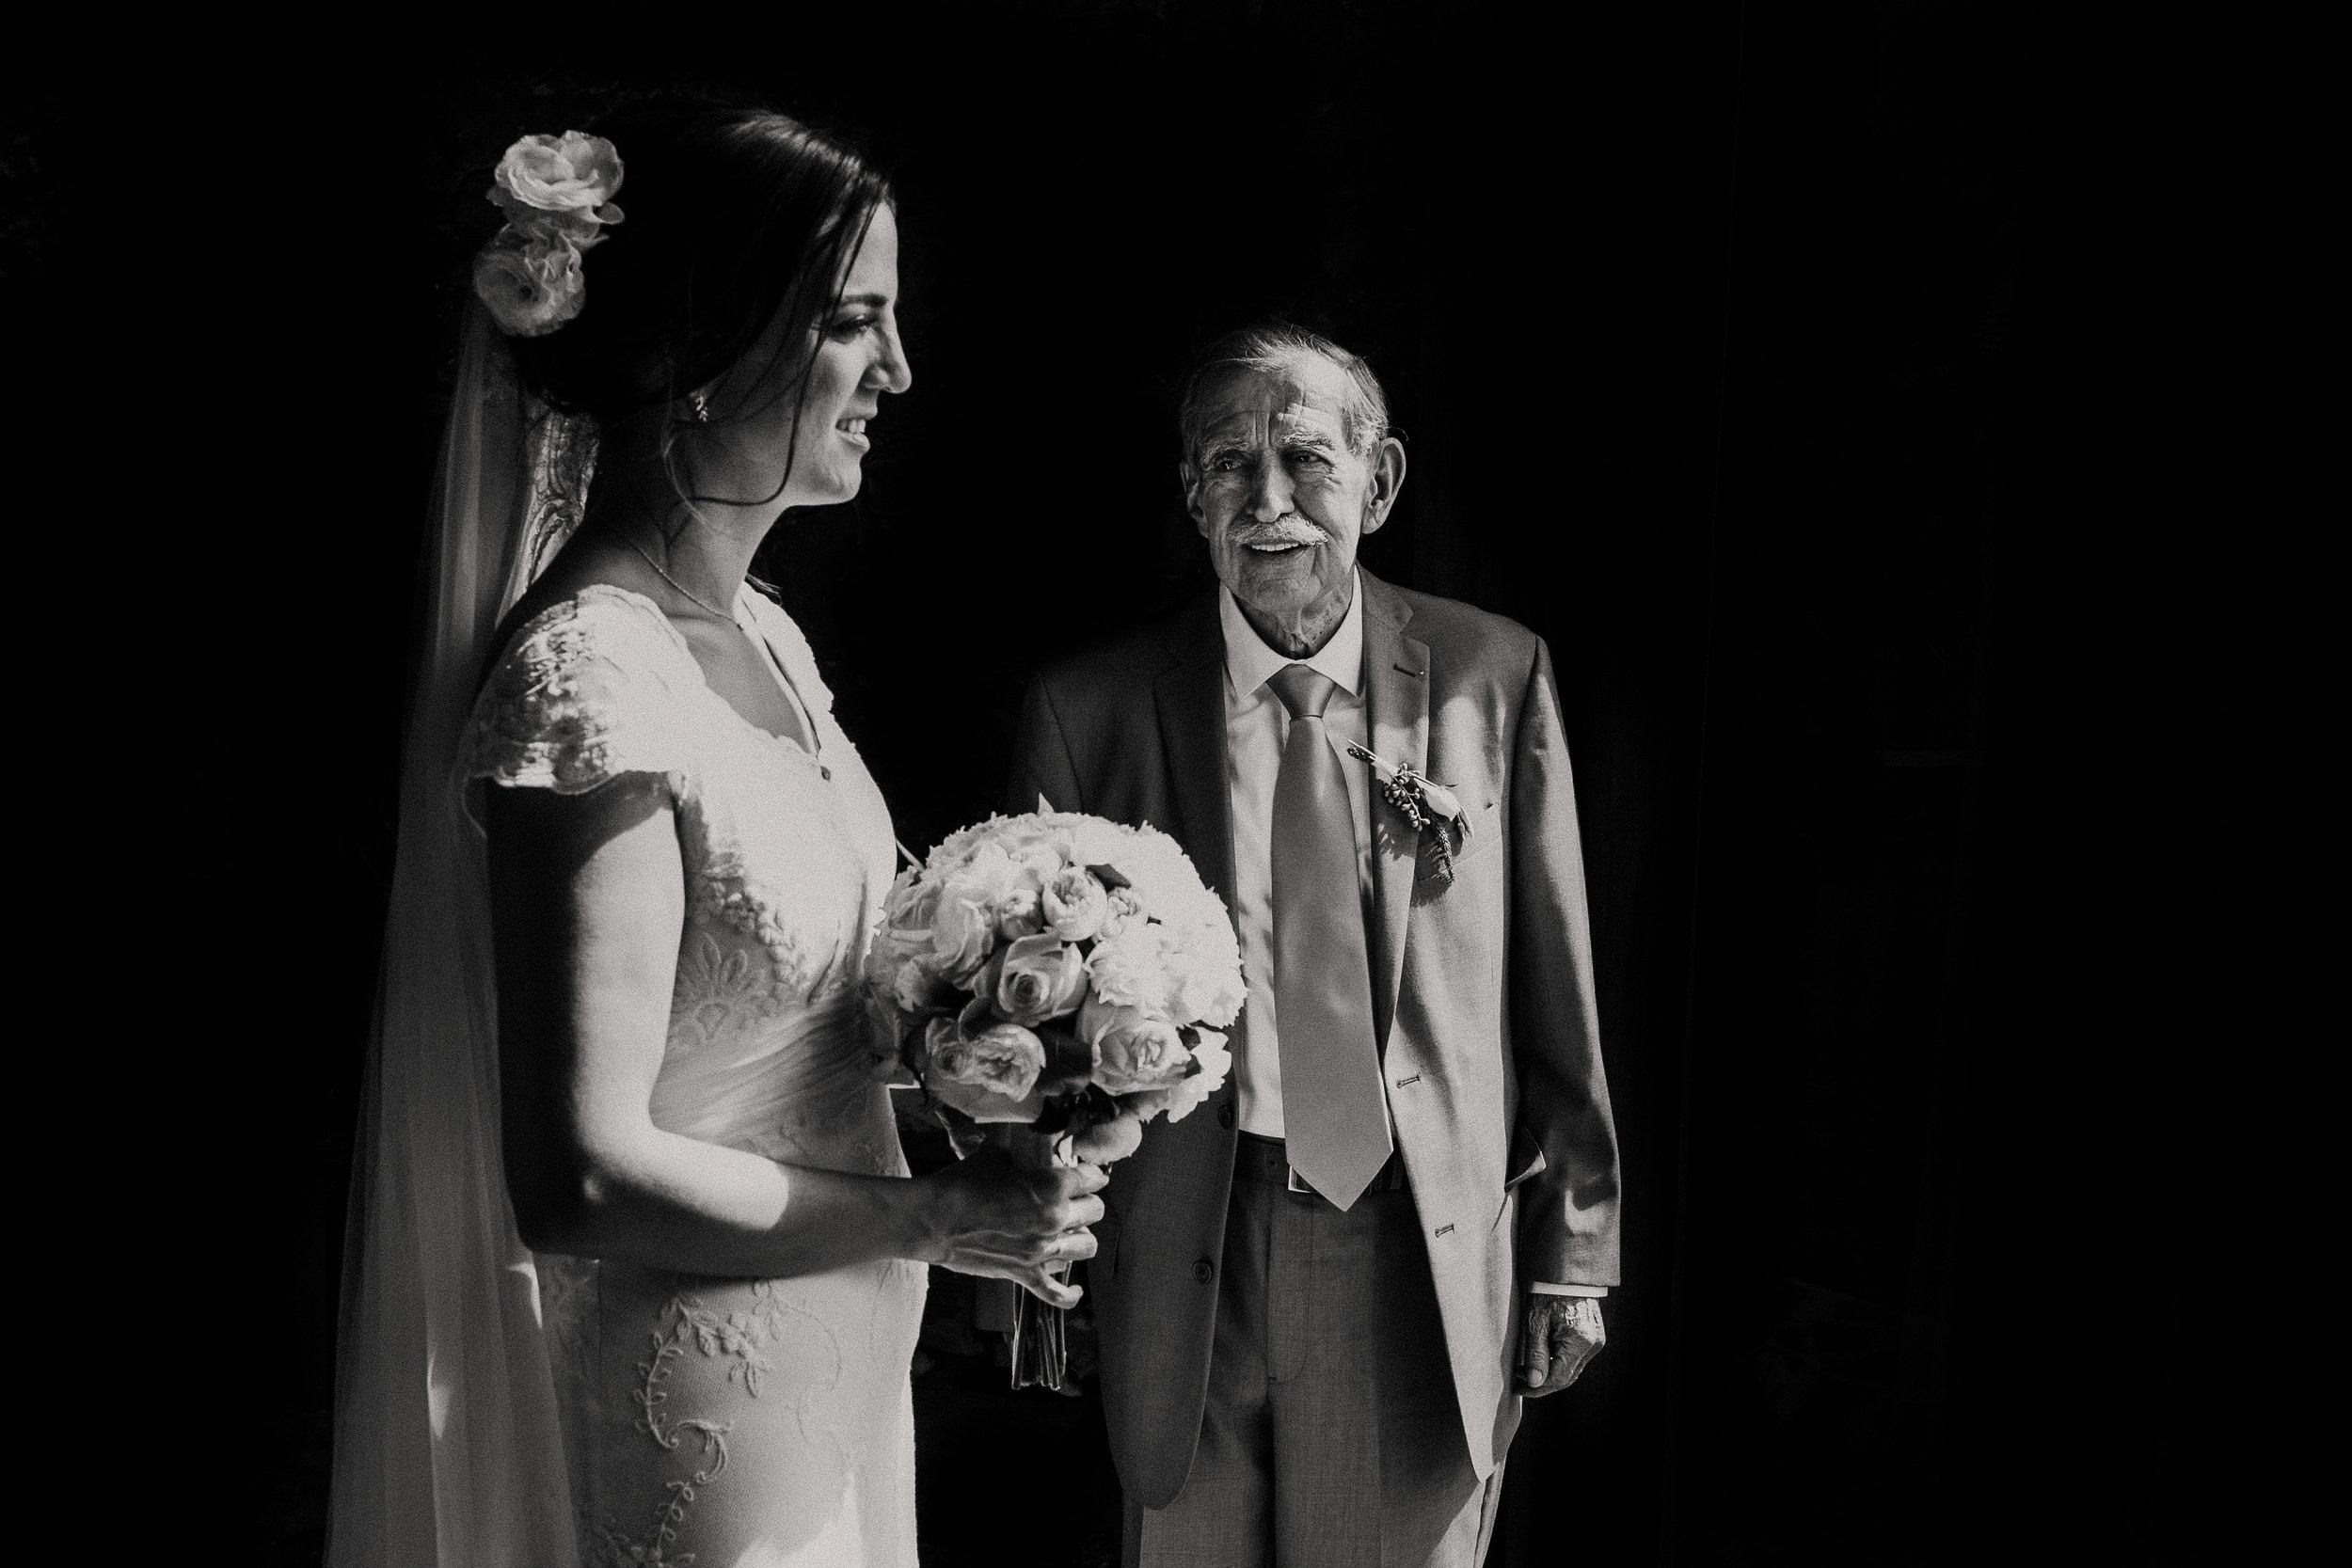 alfonso_flores_destination_wedding_photographer_pau_alonso_760.JPG